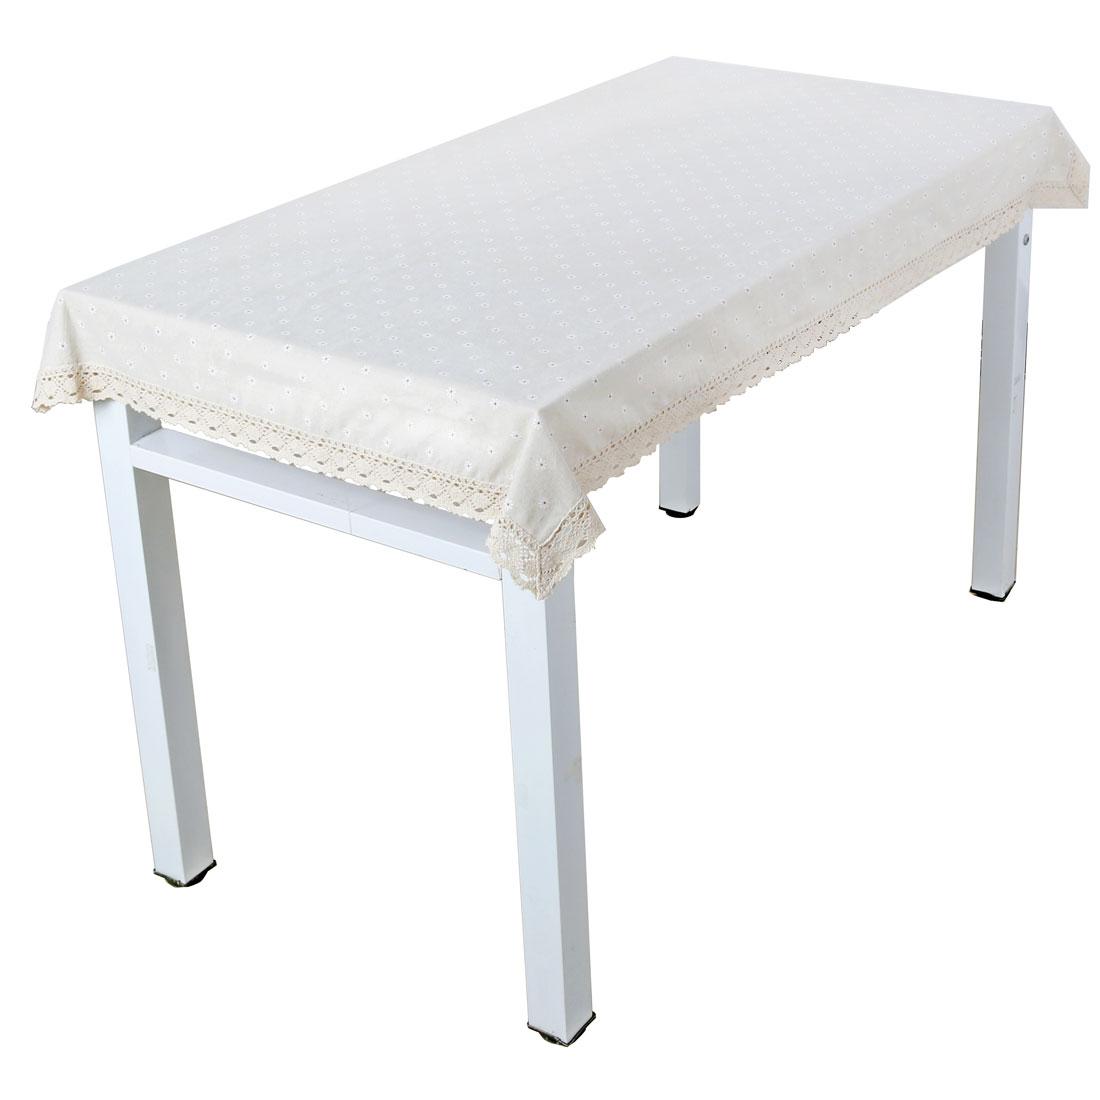 Vintage White Chrysanthemum Tablecloth Cotton Linen Washable Table Cover 140 x 220cm